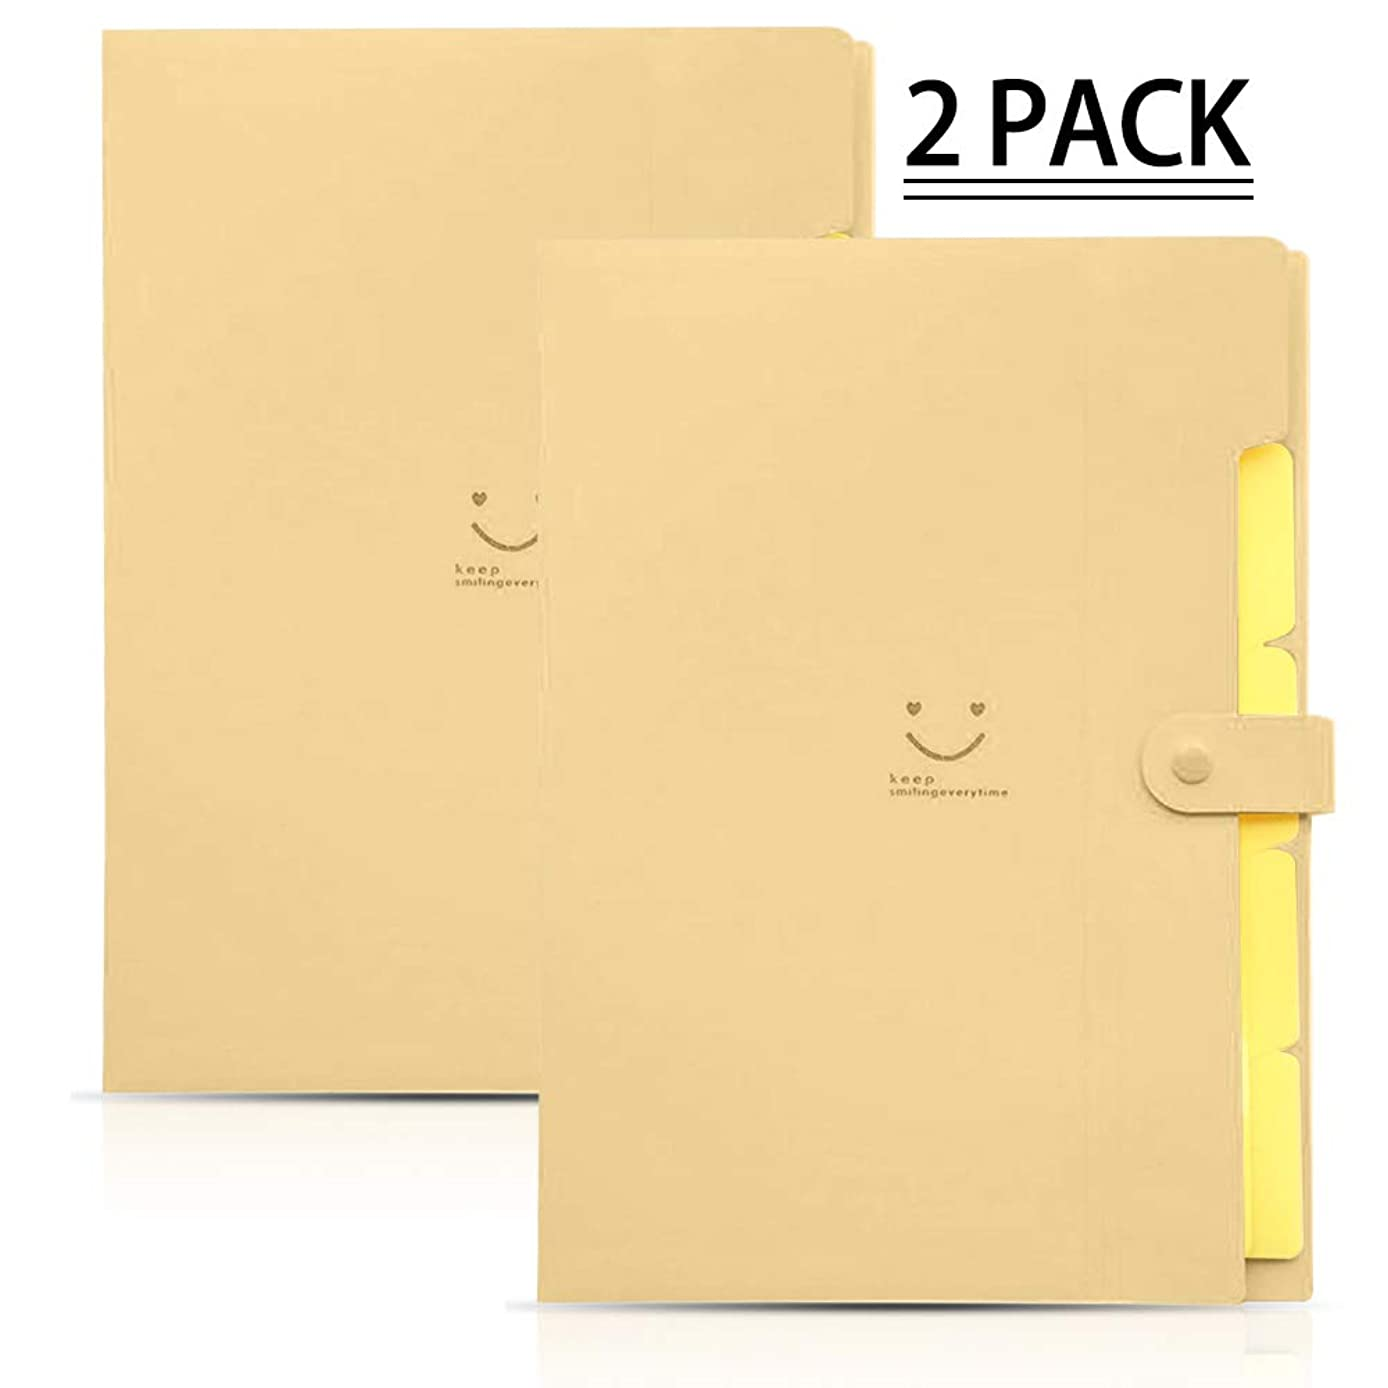 YASSUN File Folder 5 Pockets, Folder Test Paper Clip, Accordion Document Organizer, Multi-Layer A4 File Folders, 2 Pack (Beige)